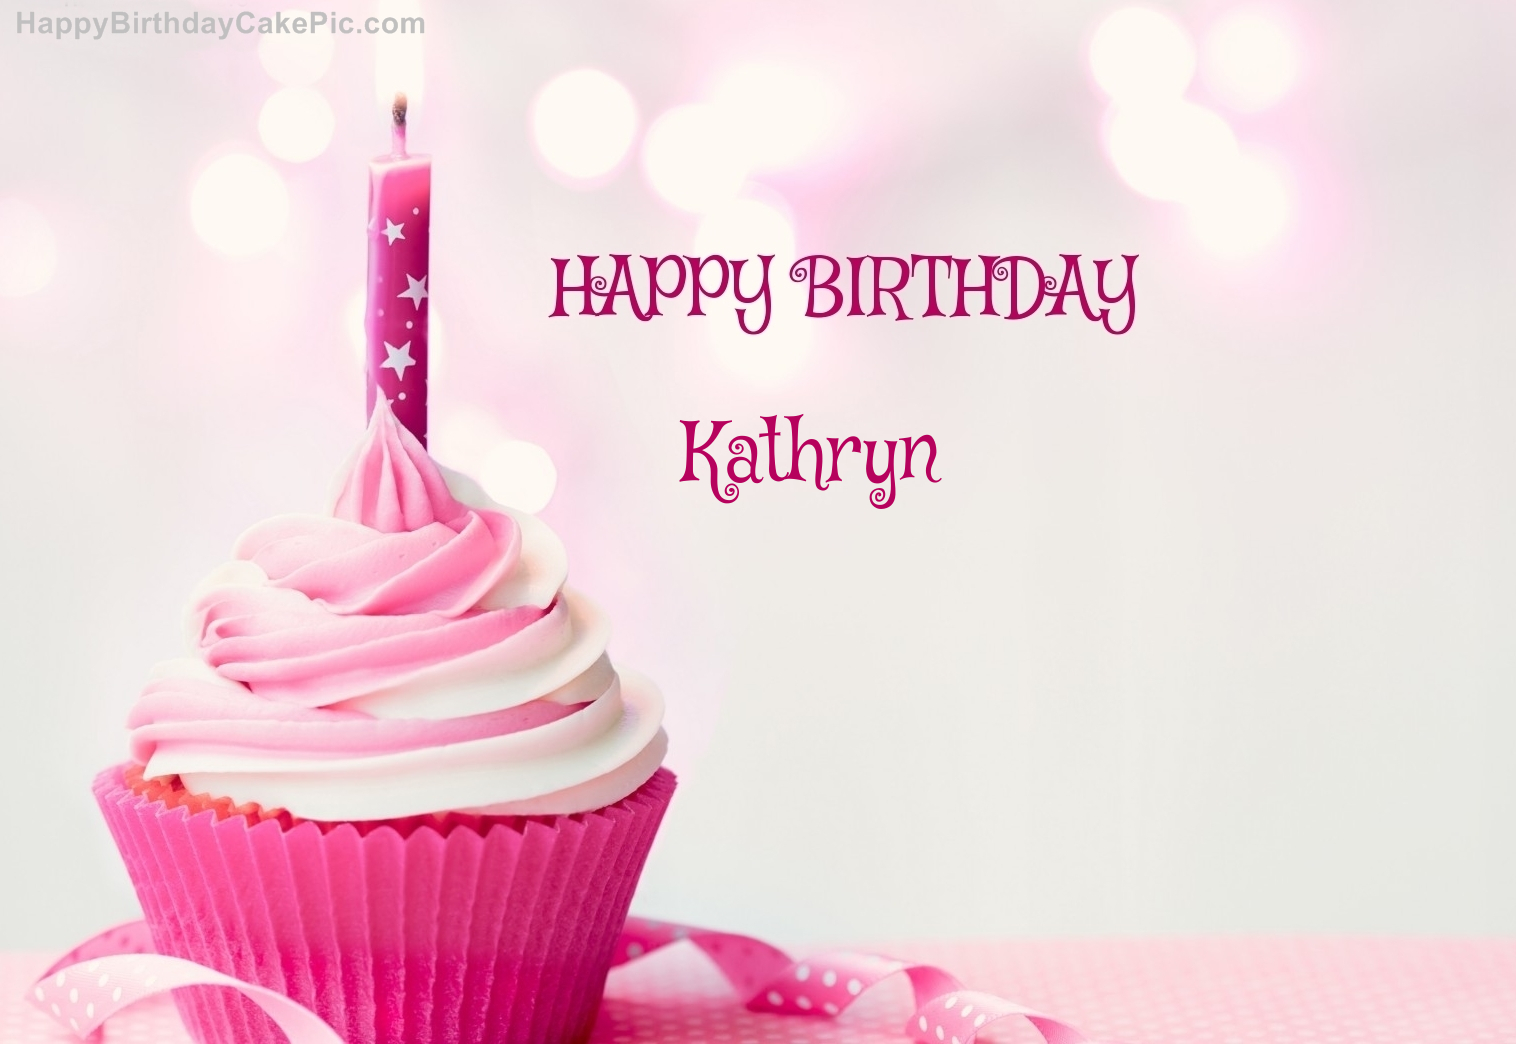 Birthday Cake Kathryn Image Inspiration of Cake and Birthday